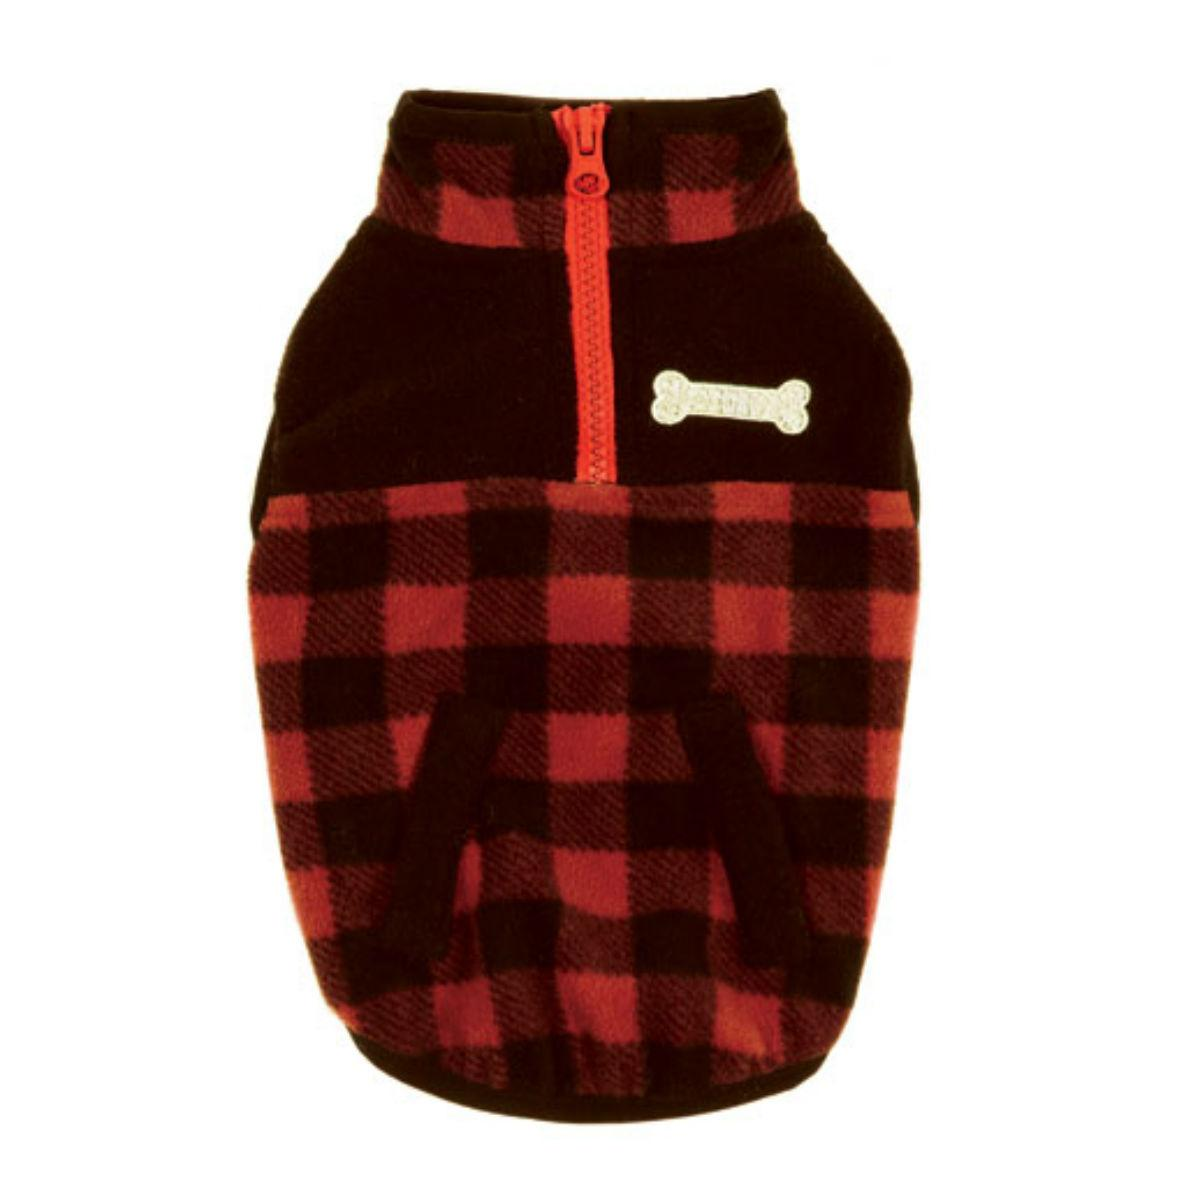 Zack & Zoey Buffalo Plaid Fleece Dog Jacket - Red